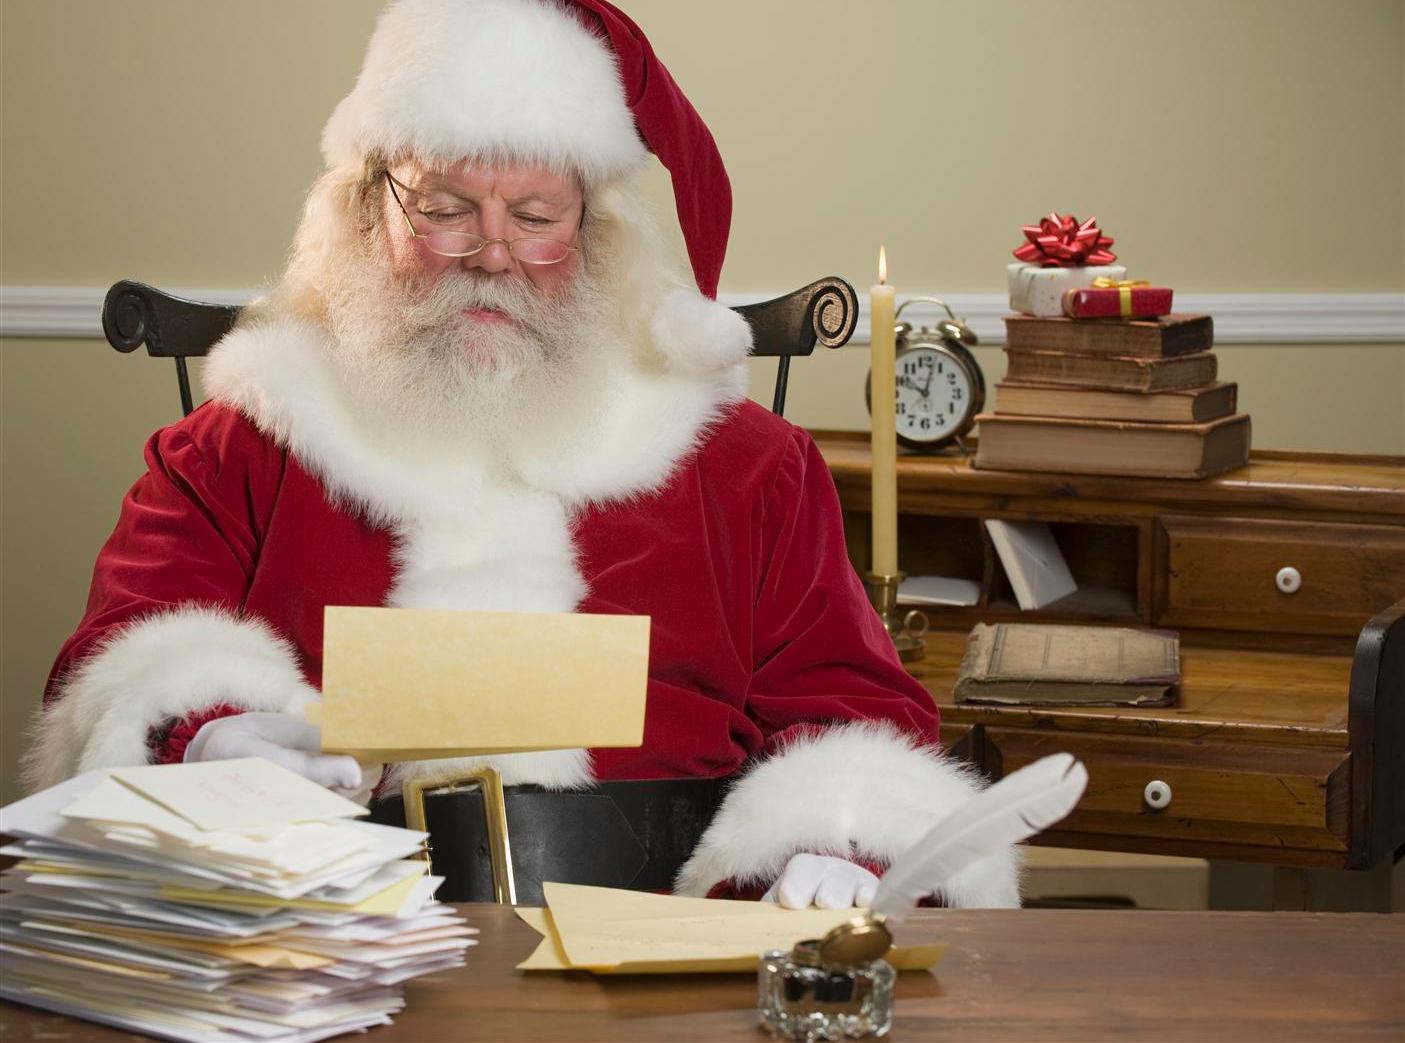 Babbo Natale Letterine.Quattro Letterine Per Babbo Natale Tgcom24